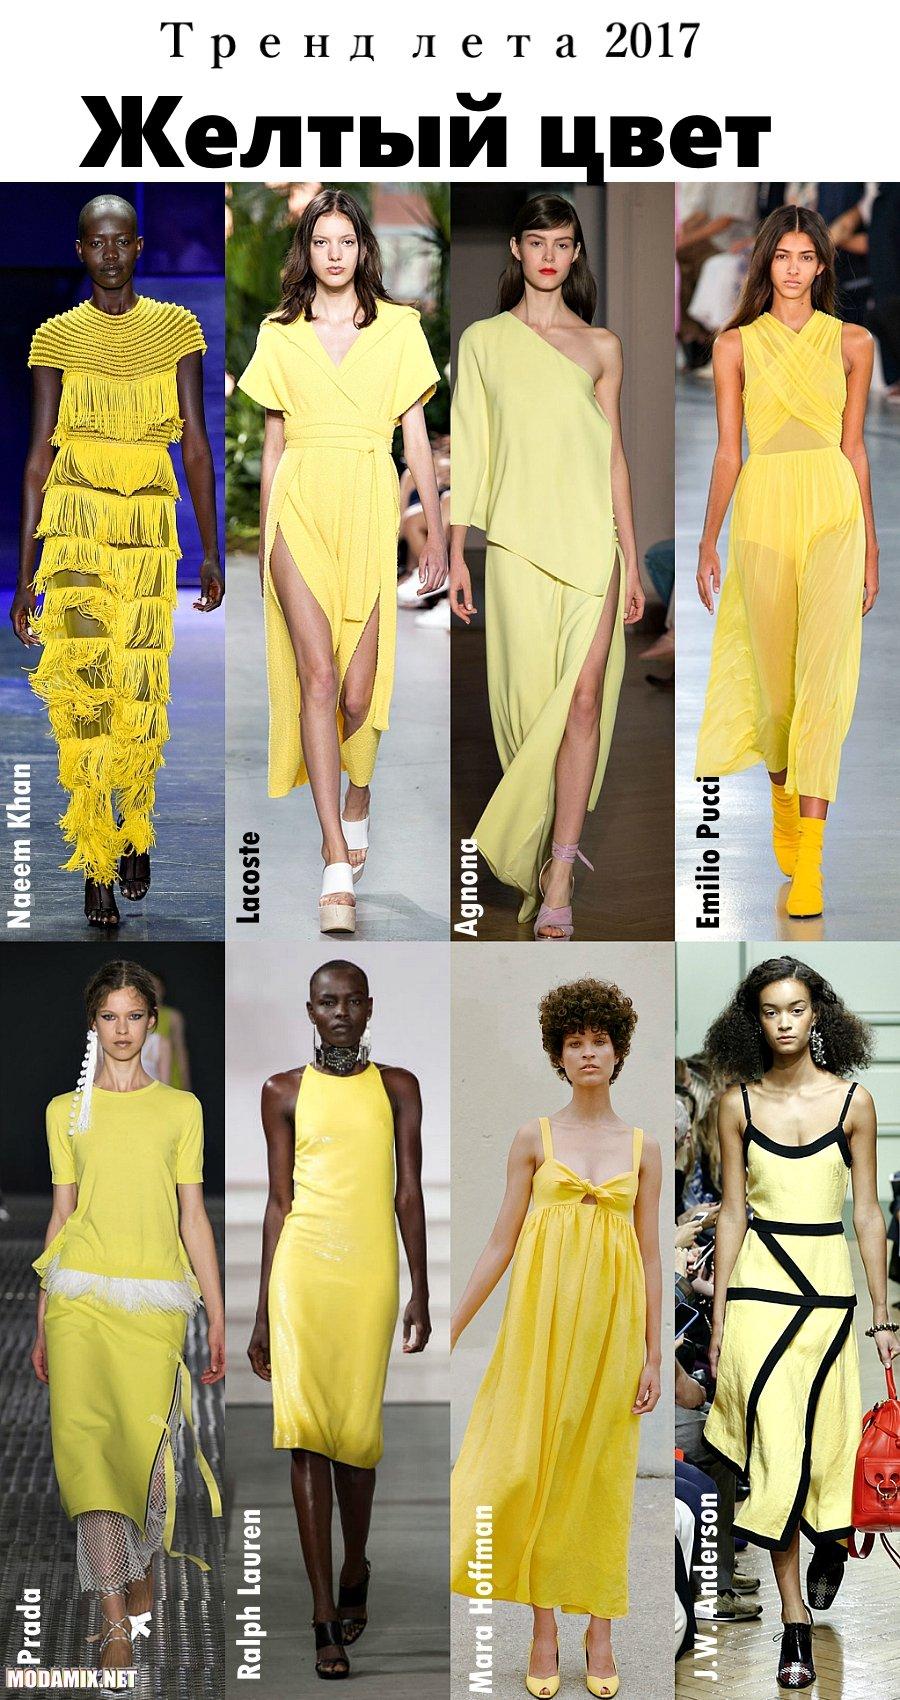 Что модно летом 2017 - желтый